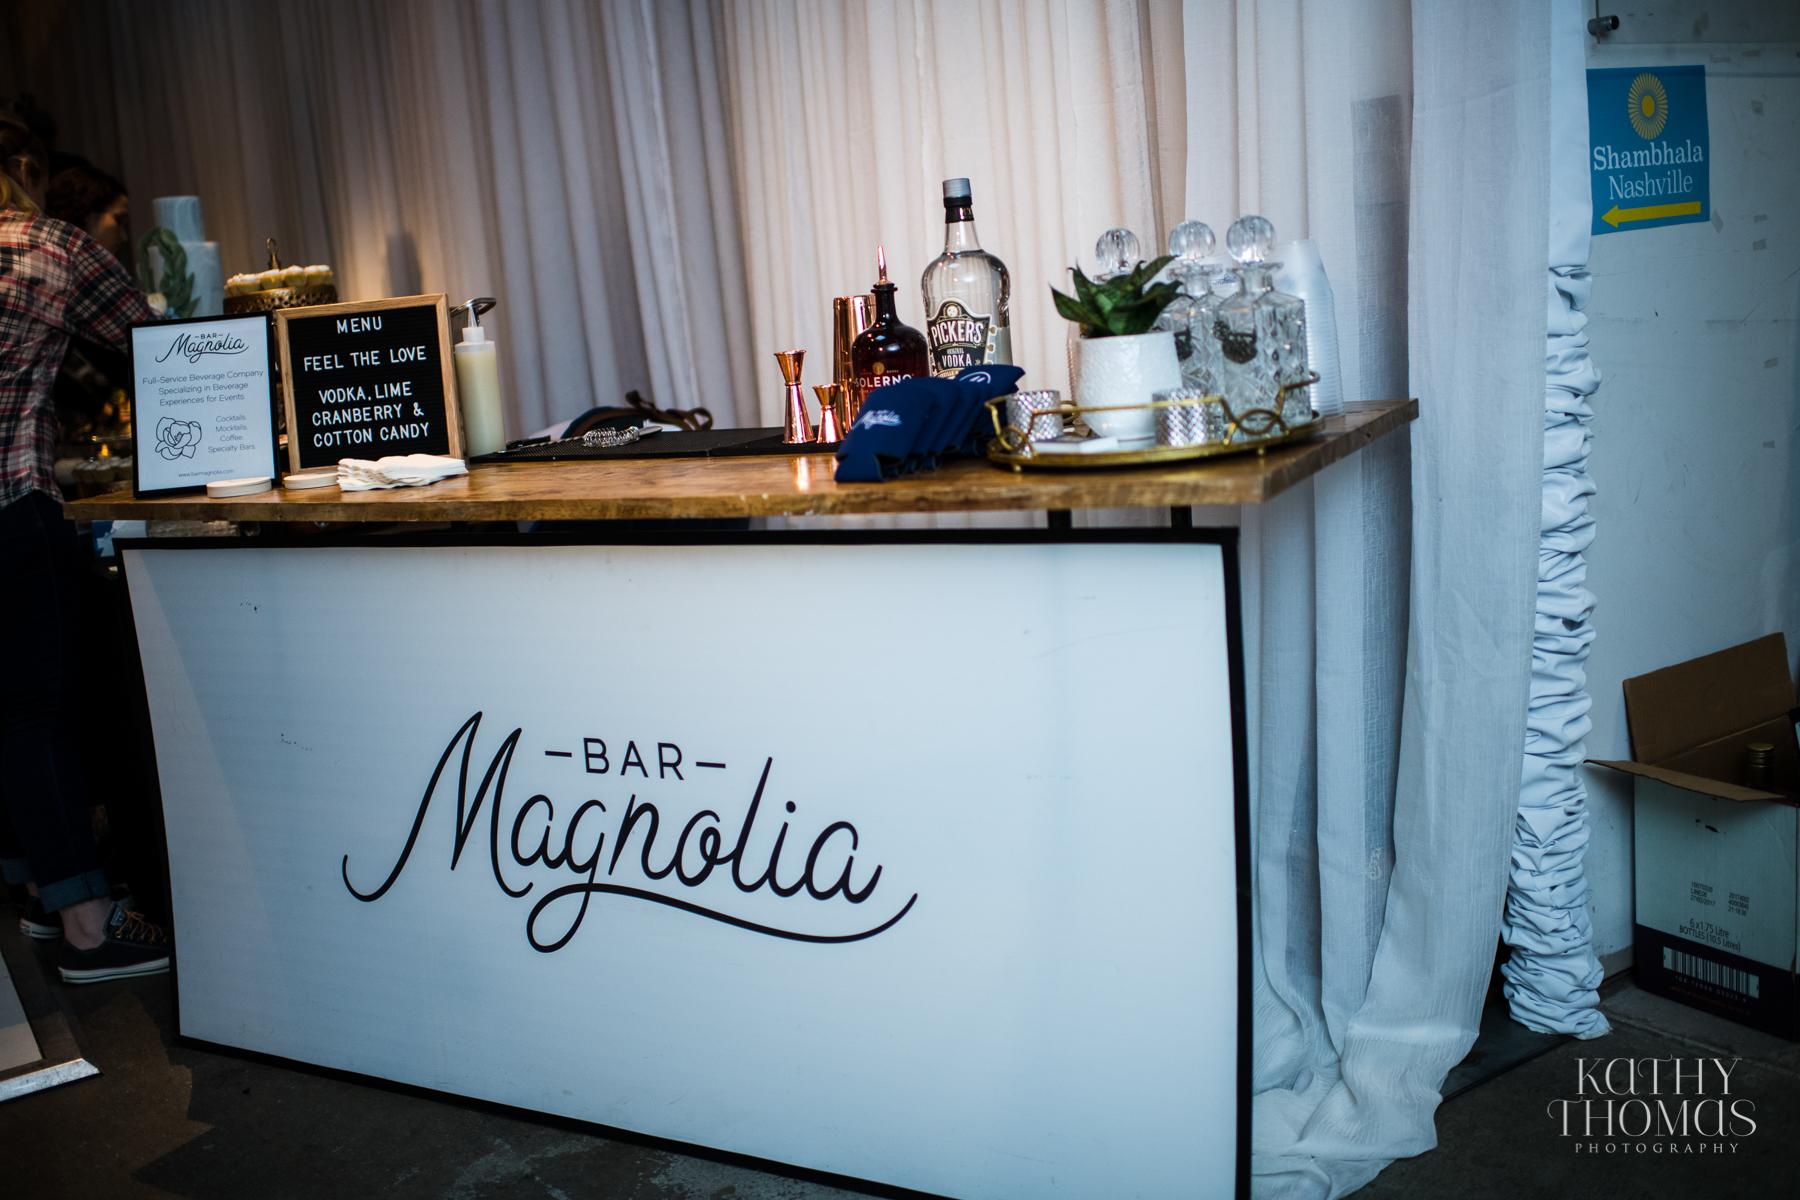 Nashville_Weddings_Kathy_Thomas_Photography-1544.jpg